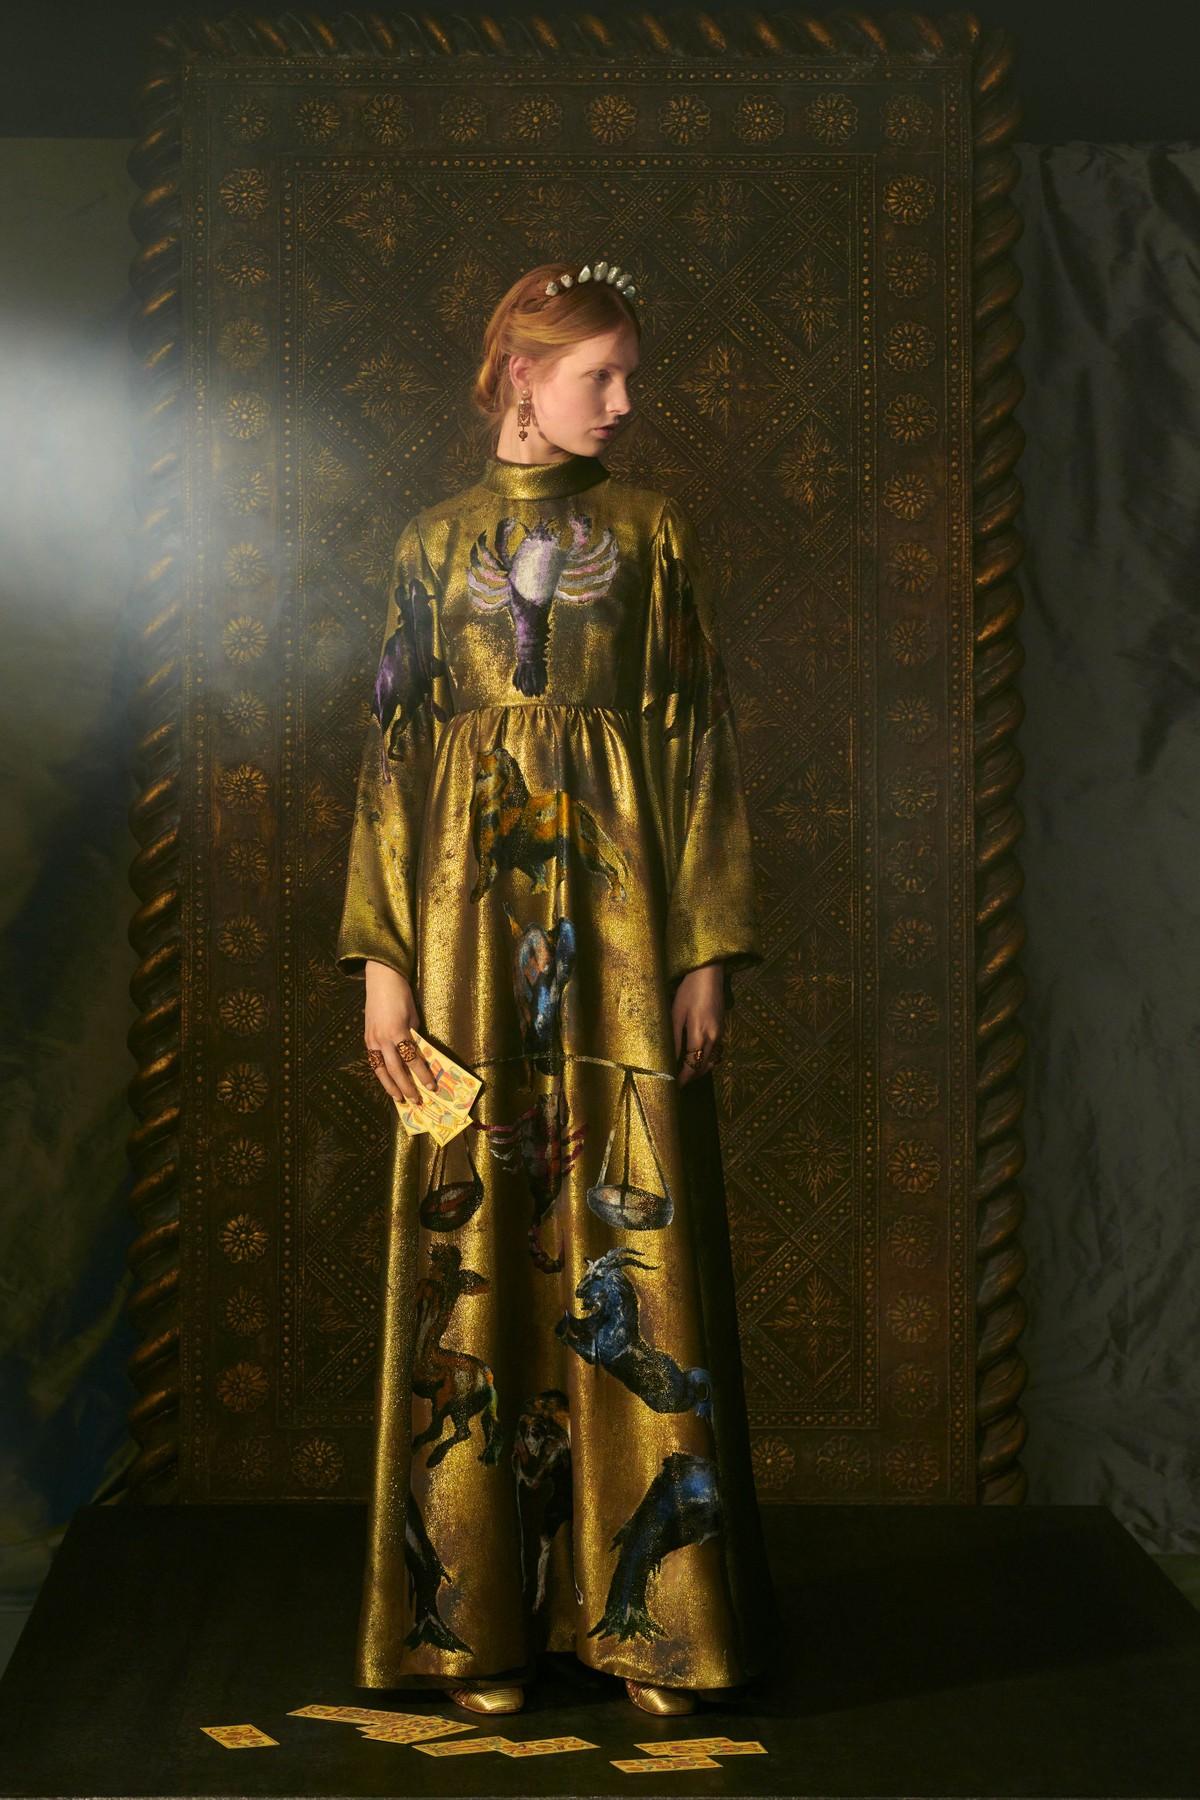 00032-dior-couture-spring-2021-credit-elina-kechicheva.jpg